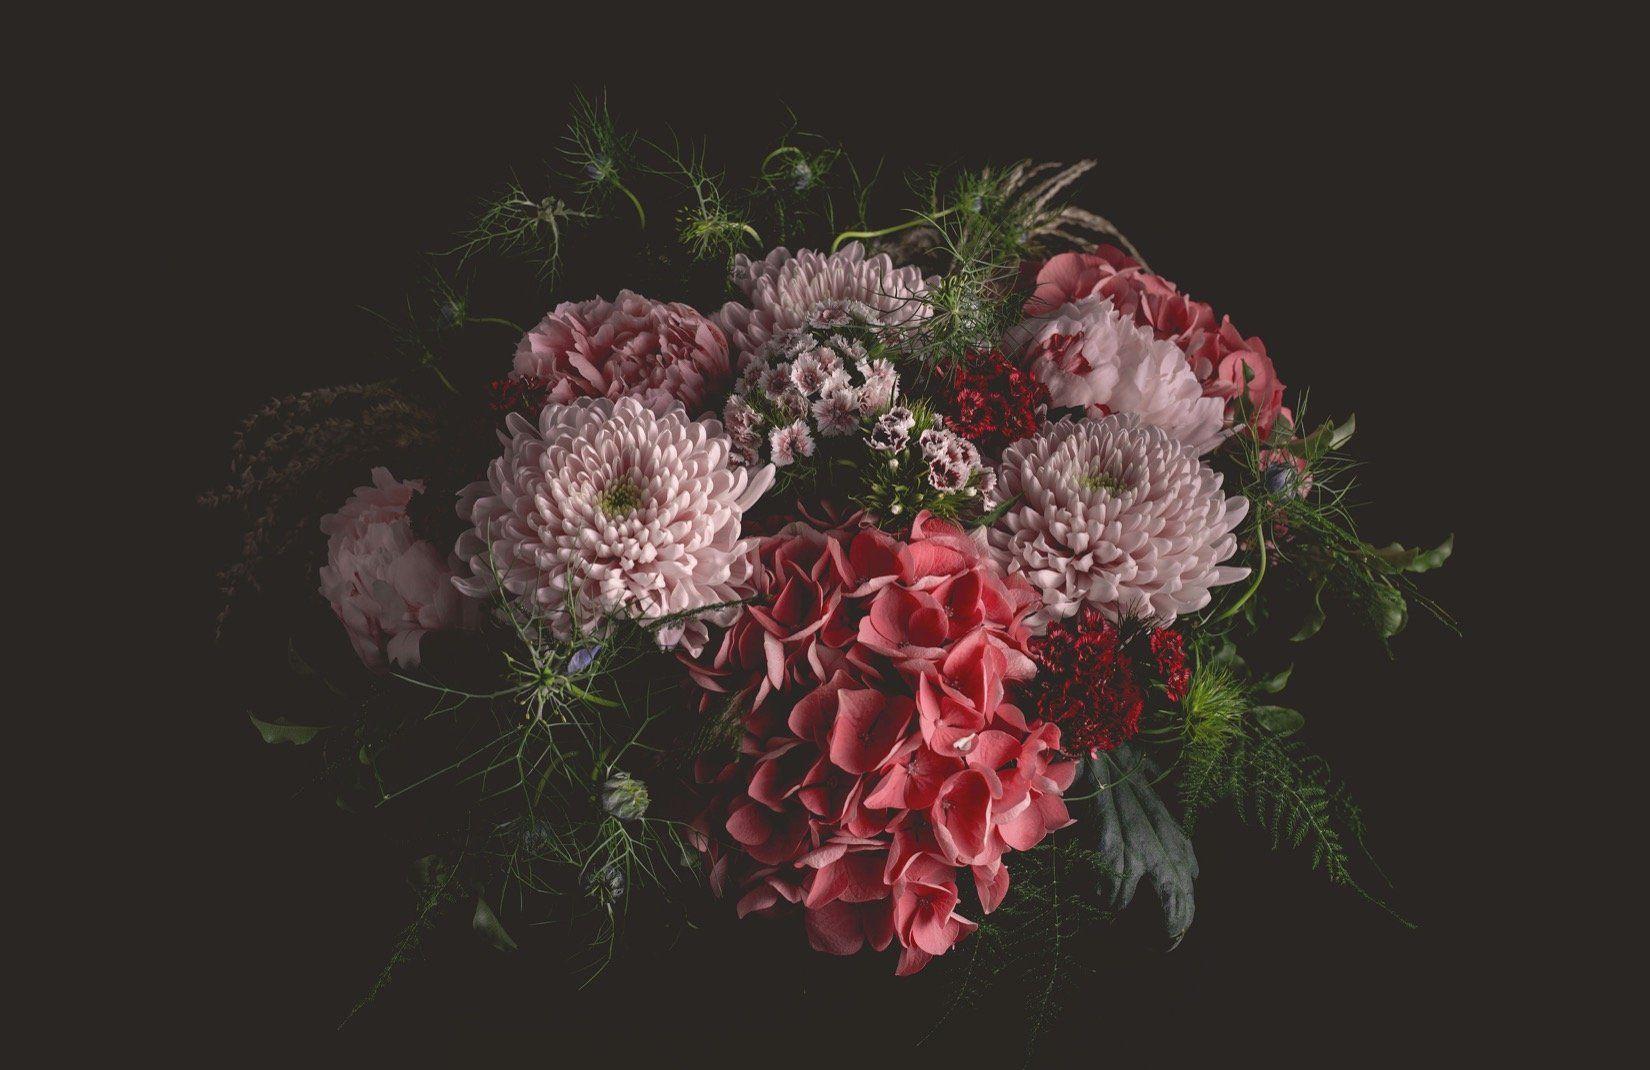 Dark Moody Floral Wallpaper Large Scale Design